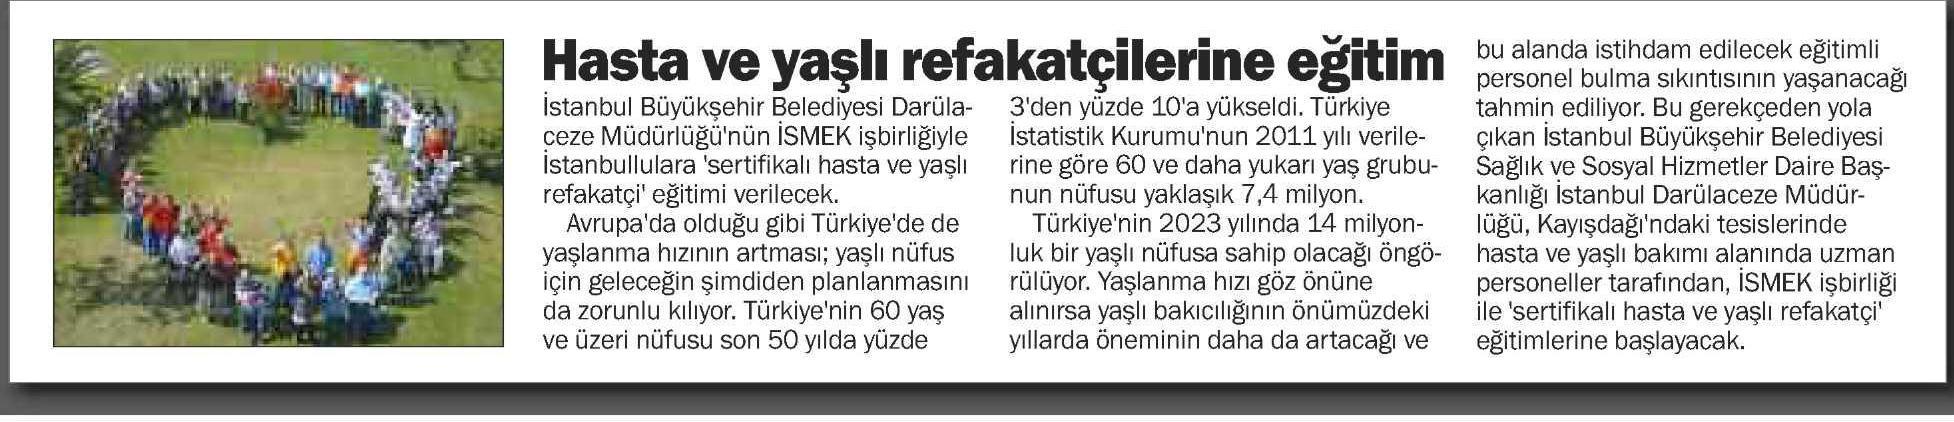 23.10.2012_haber_vaktim_egitim